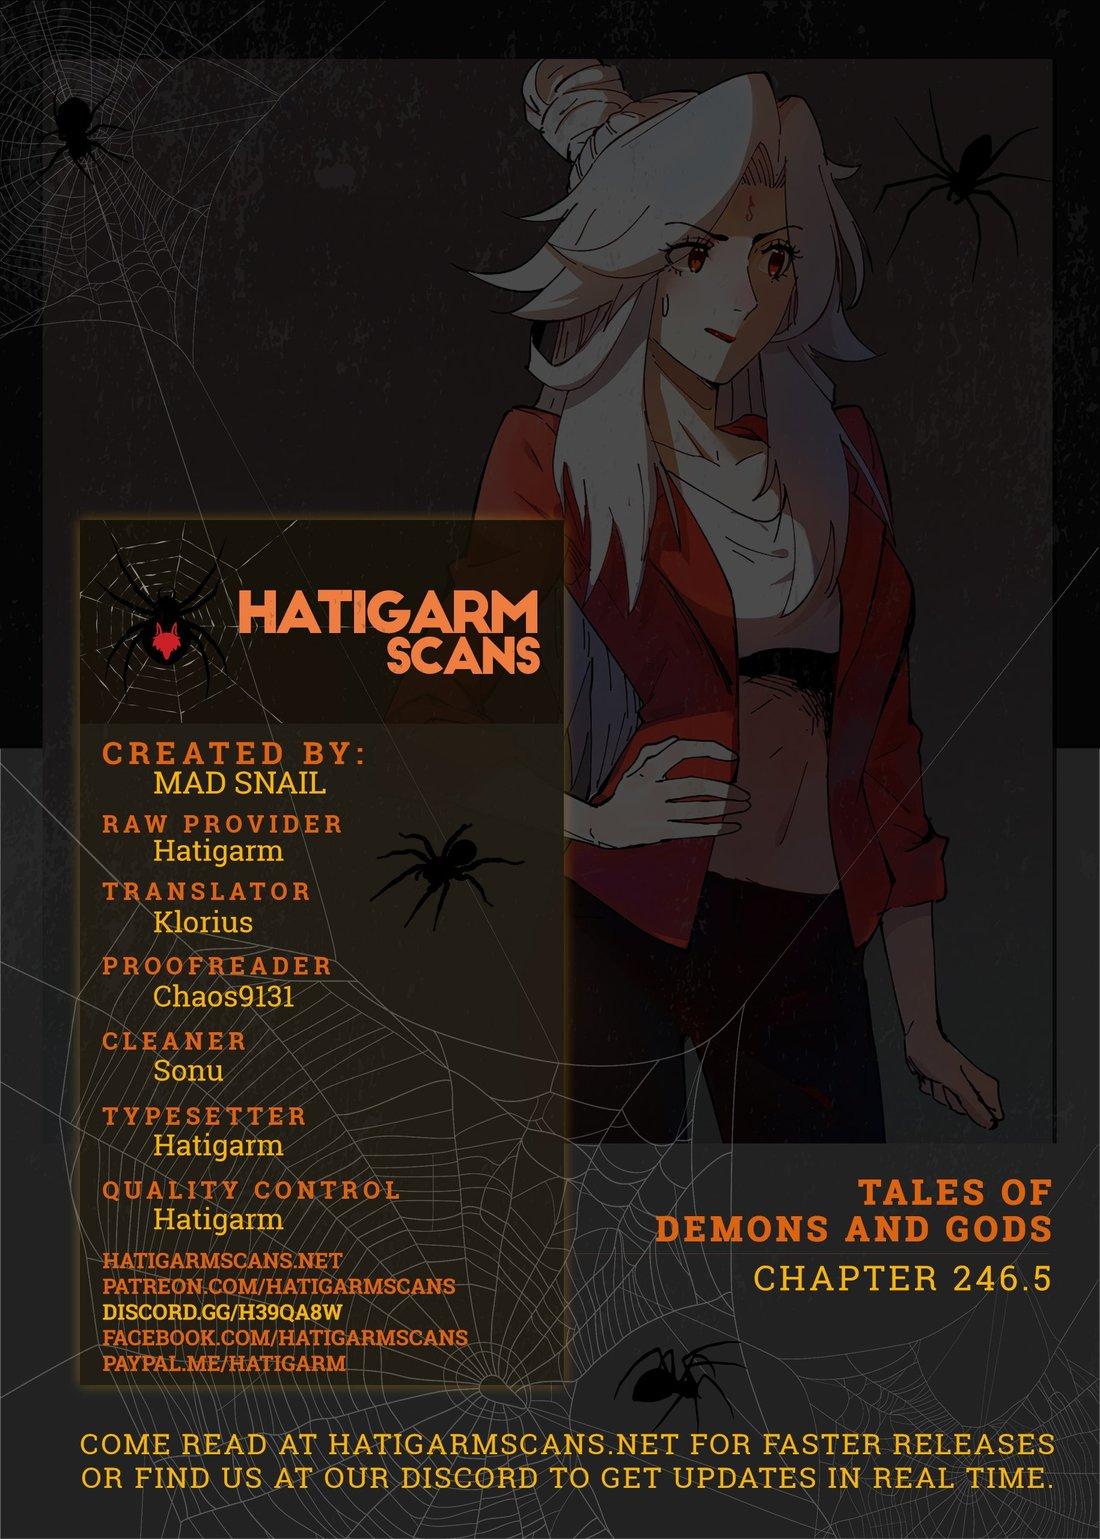 https://manga.mangadogs.com/comics/pic2/34/98/913499/1a6743c513bd8e547fa2234ef1c0003f.jpg Page 1